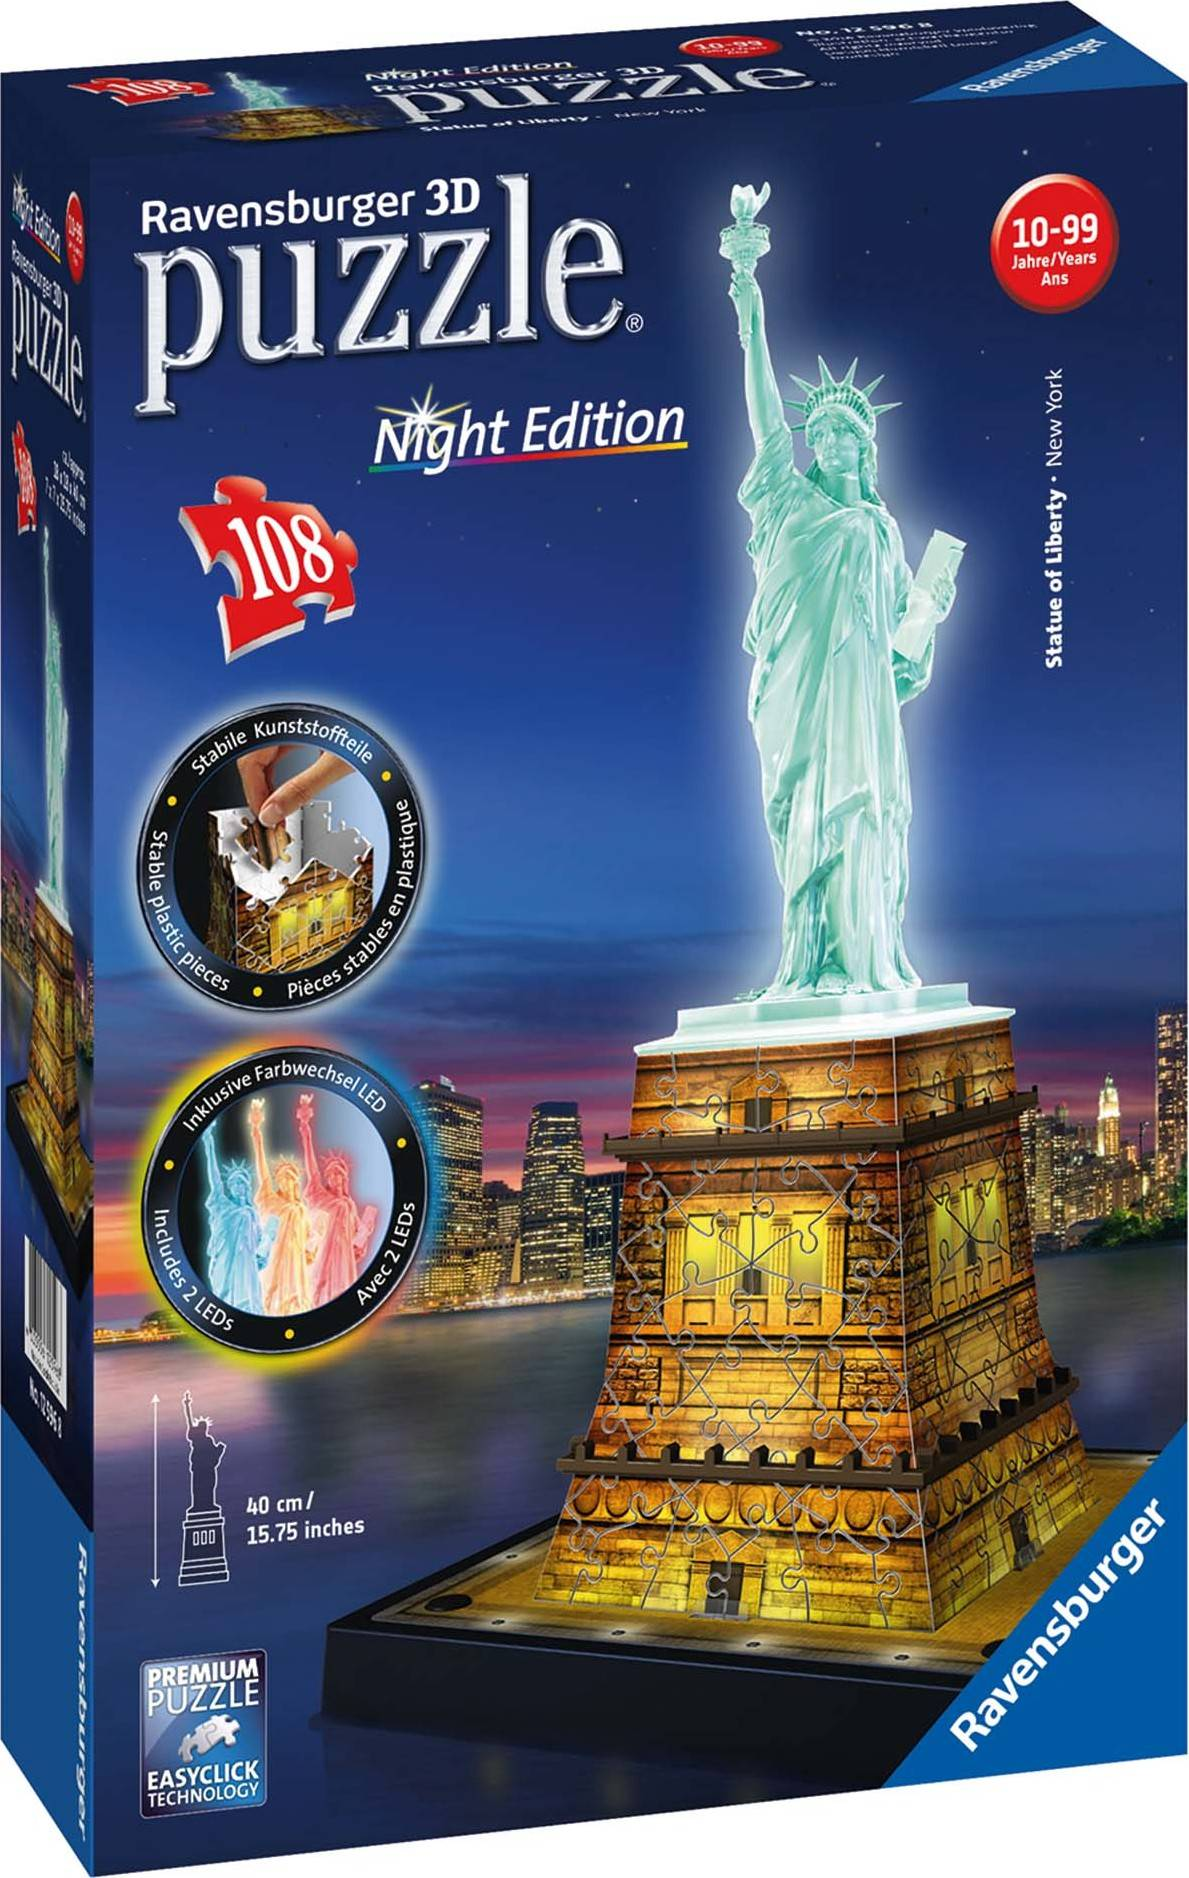 Socha Svobody 3D (Noční edice) 108d 2412596 Ravensburger